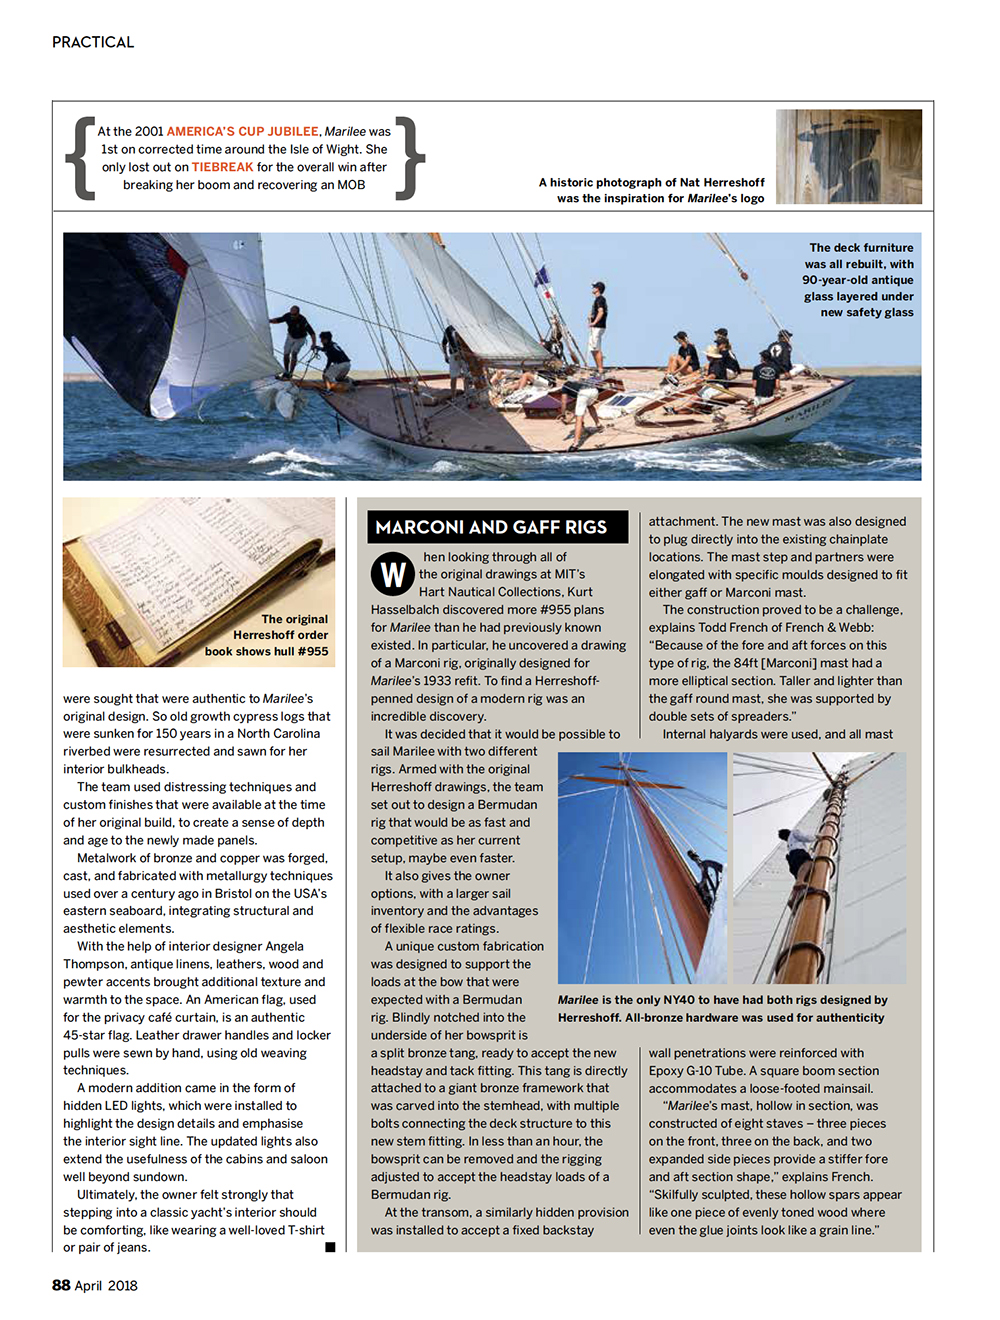 exboats_2000_3.jpg